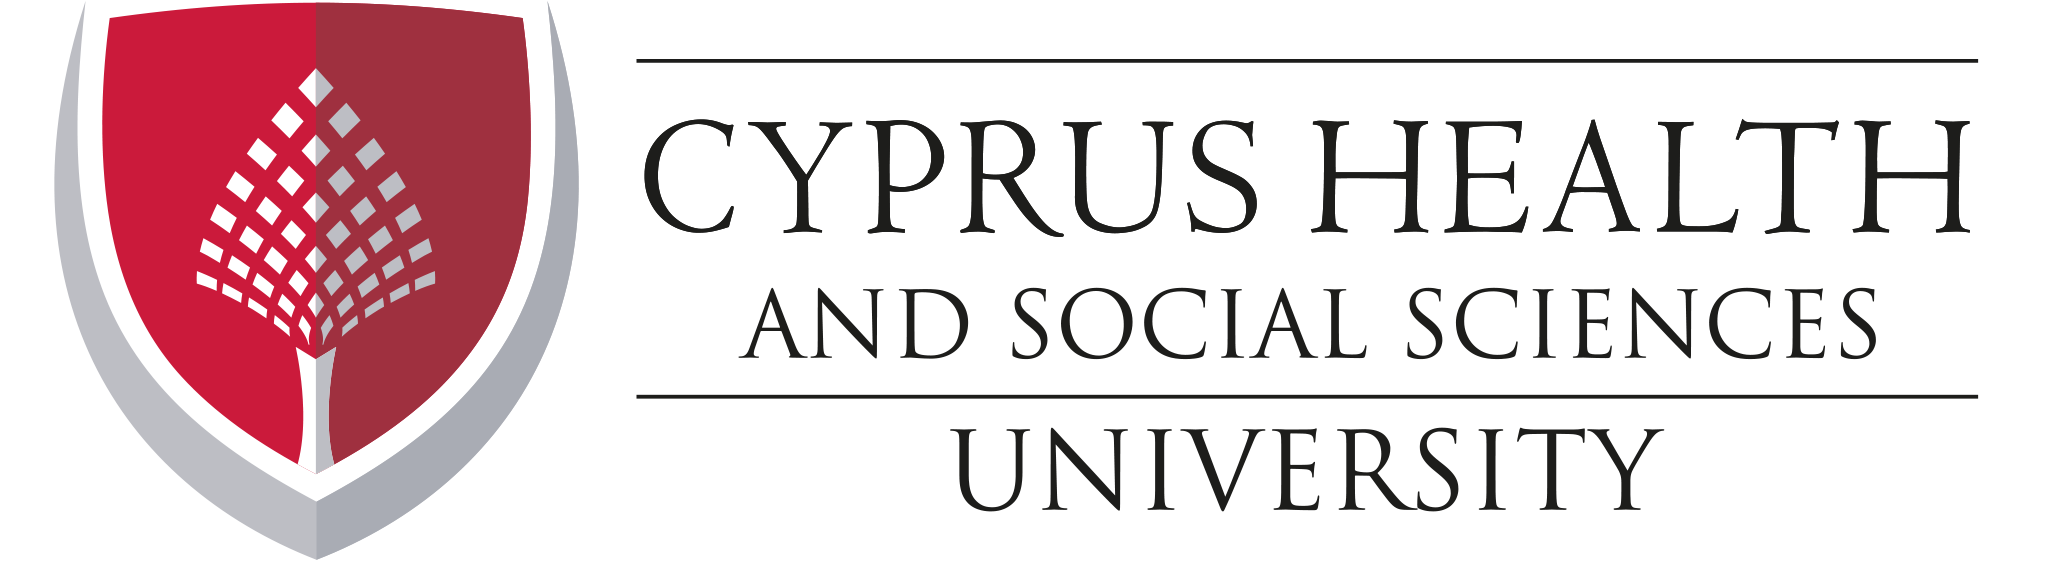 TUAS | CYPRUS HEALTH AND SOCIAL SCIENCES UNIVERSITY